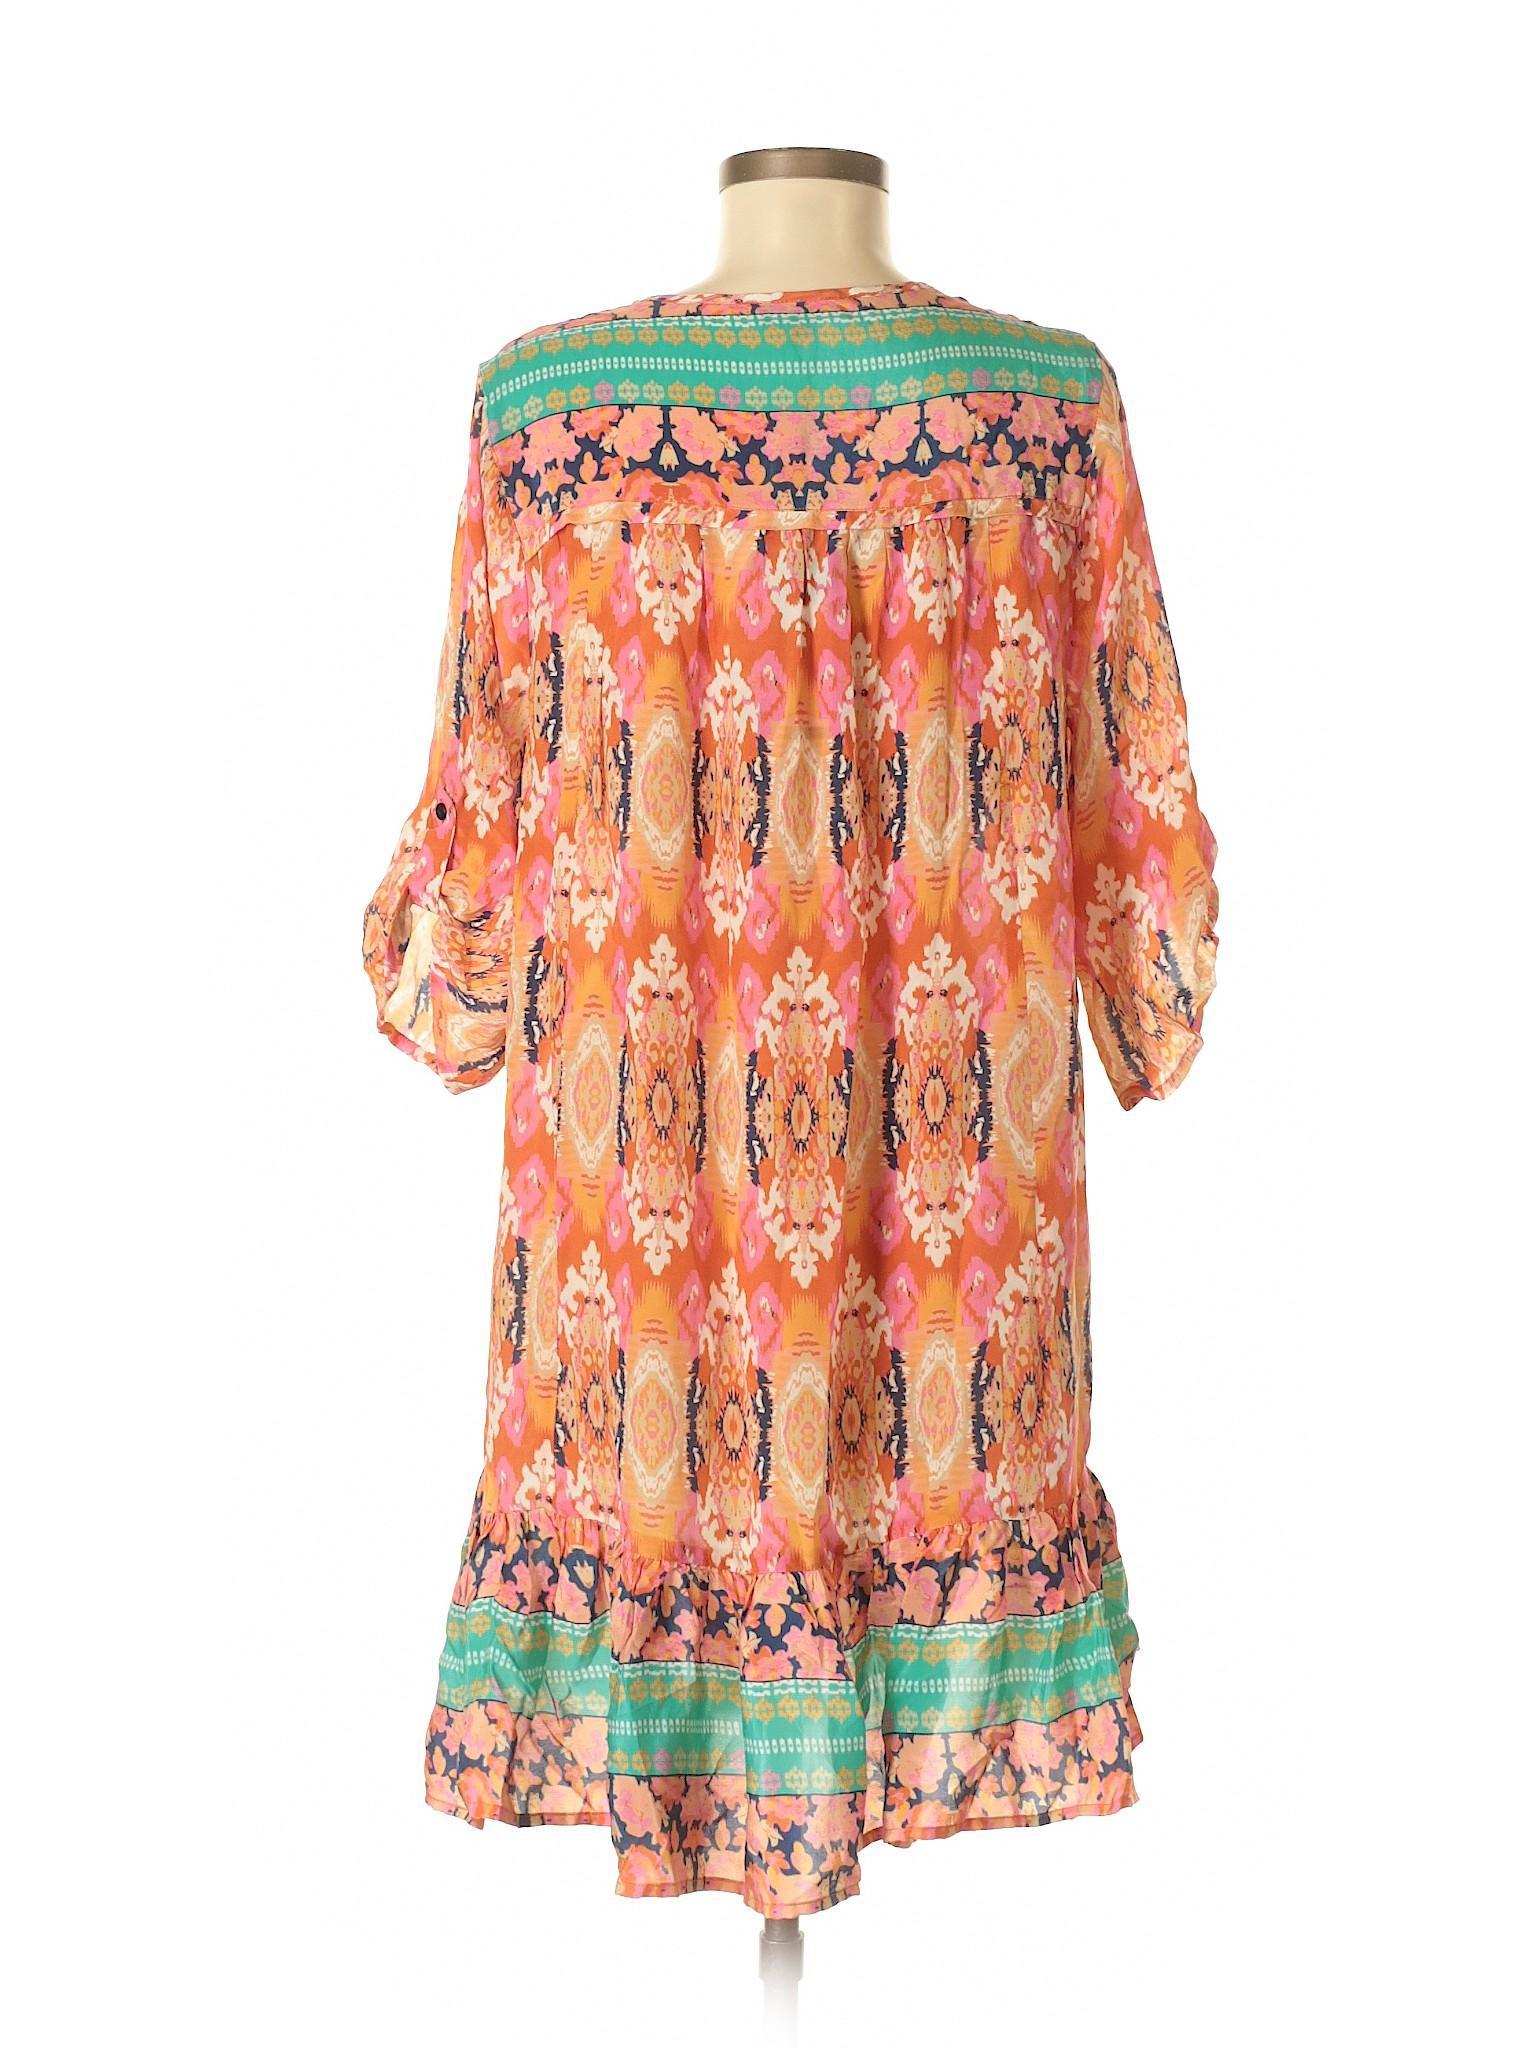 winter Dress Boutique Tolani Casual Boutique winter 6wcgqv8